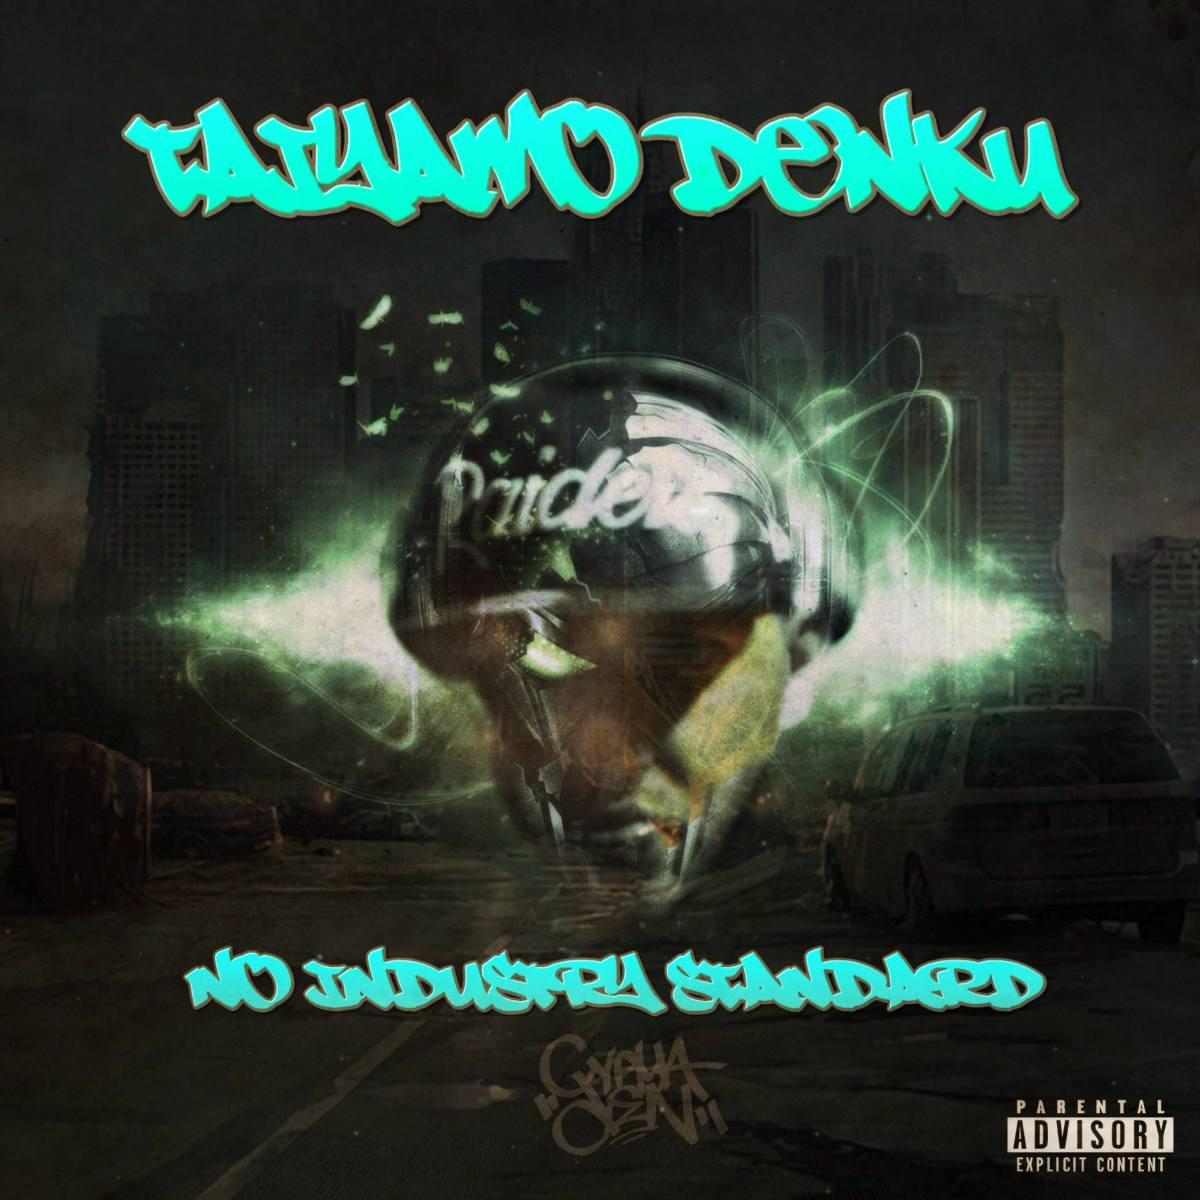 Taiyamo Denku - No Industry Standard (@TaiyamoDenku @Dcypha)